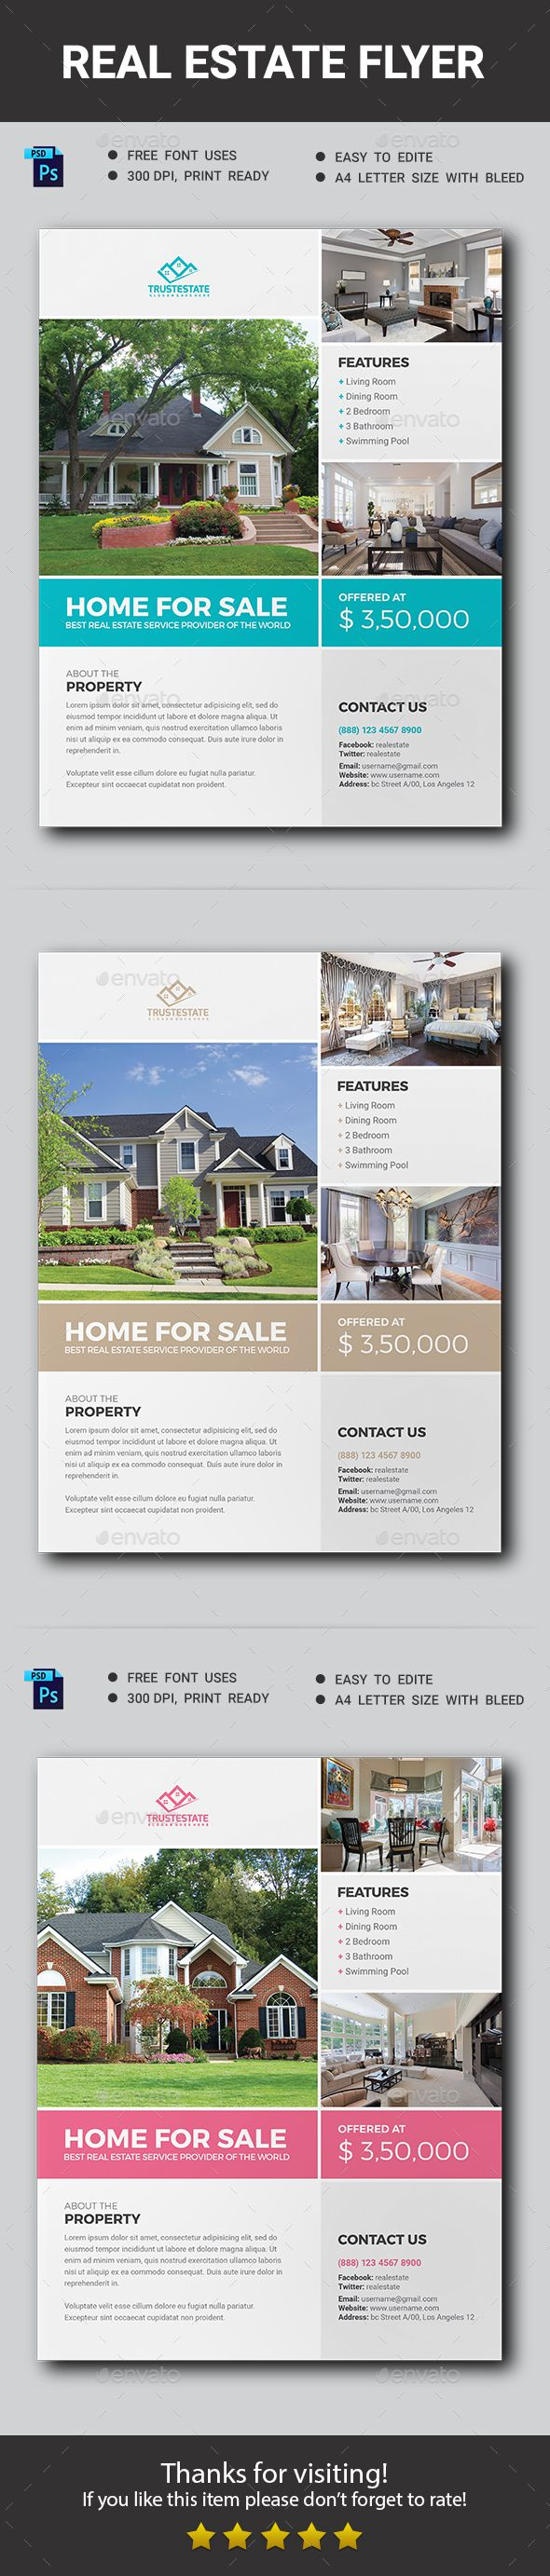 Best 25+ Real estate flyers ideas on Pinterest